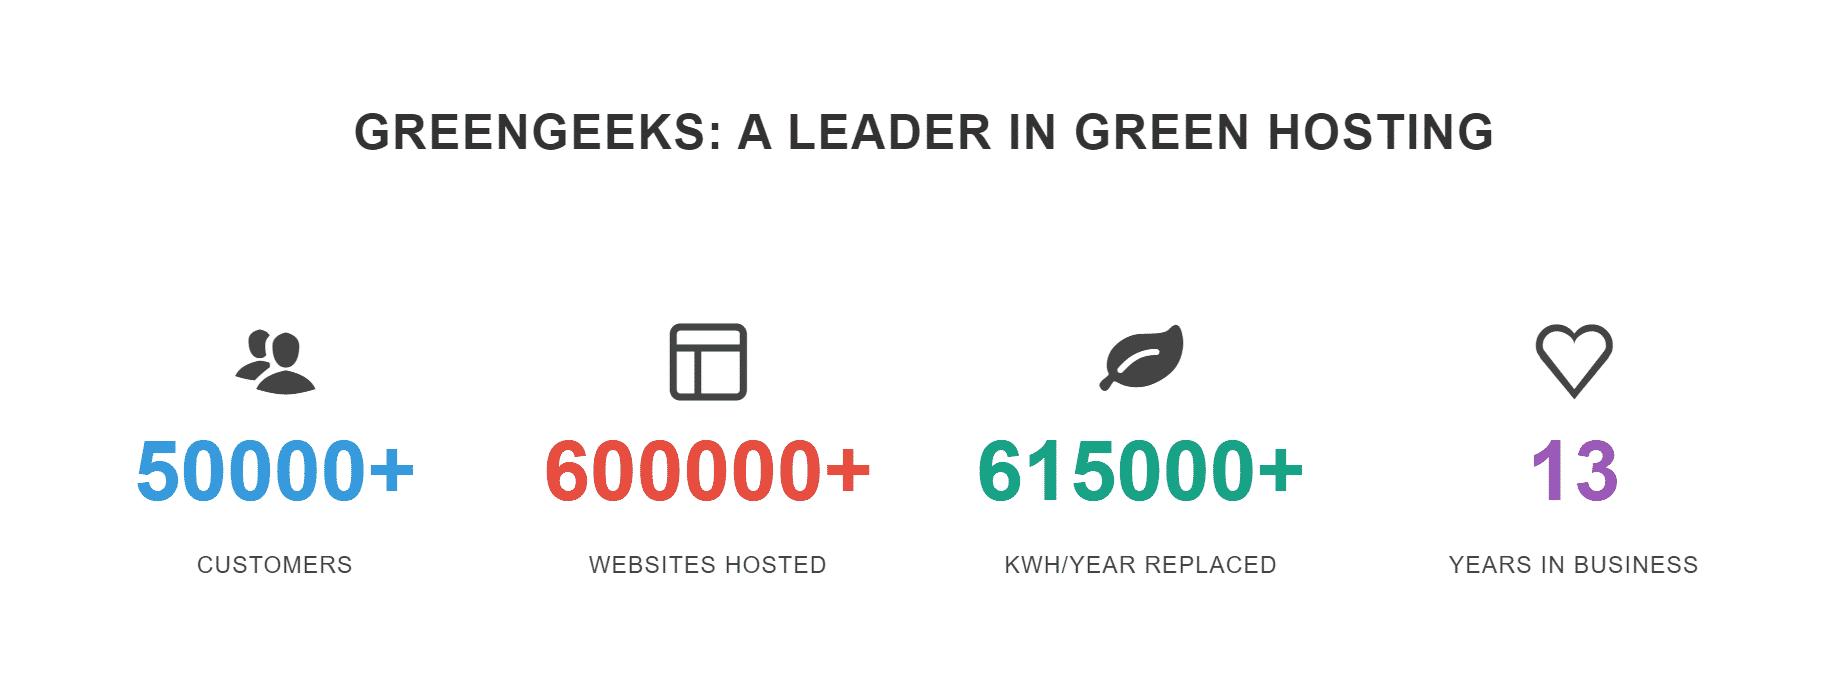 about-greengeek-hosting